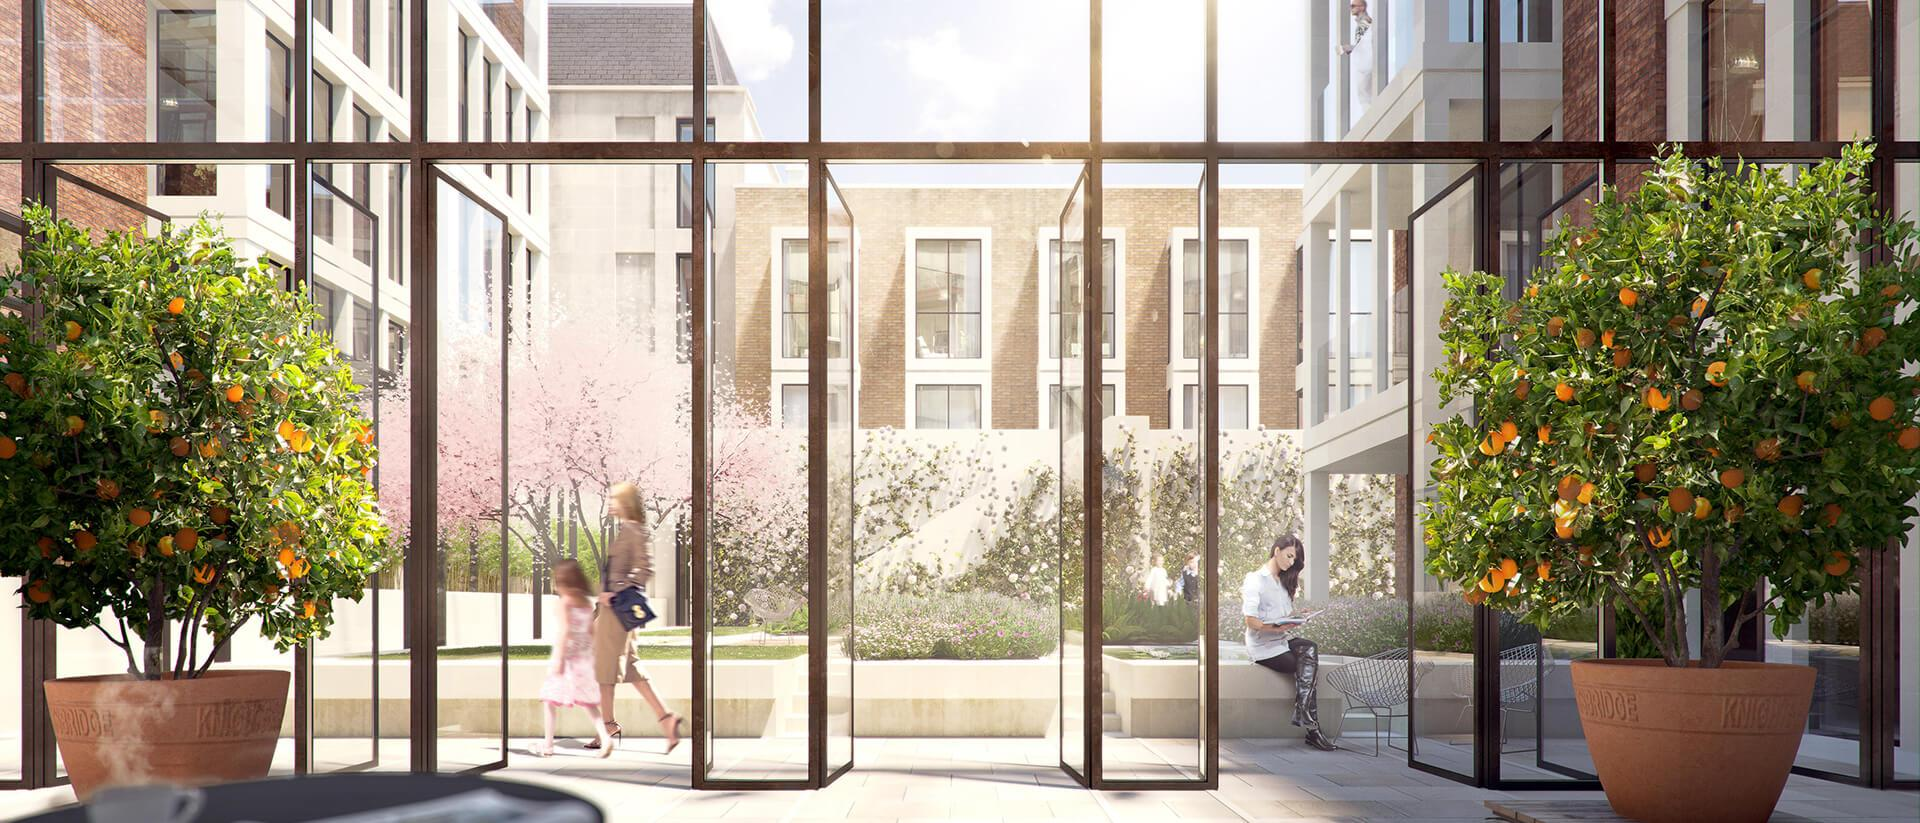 The Knightsbridge Estate, K1 Project Cover